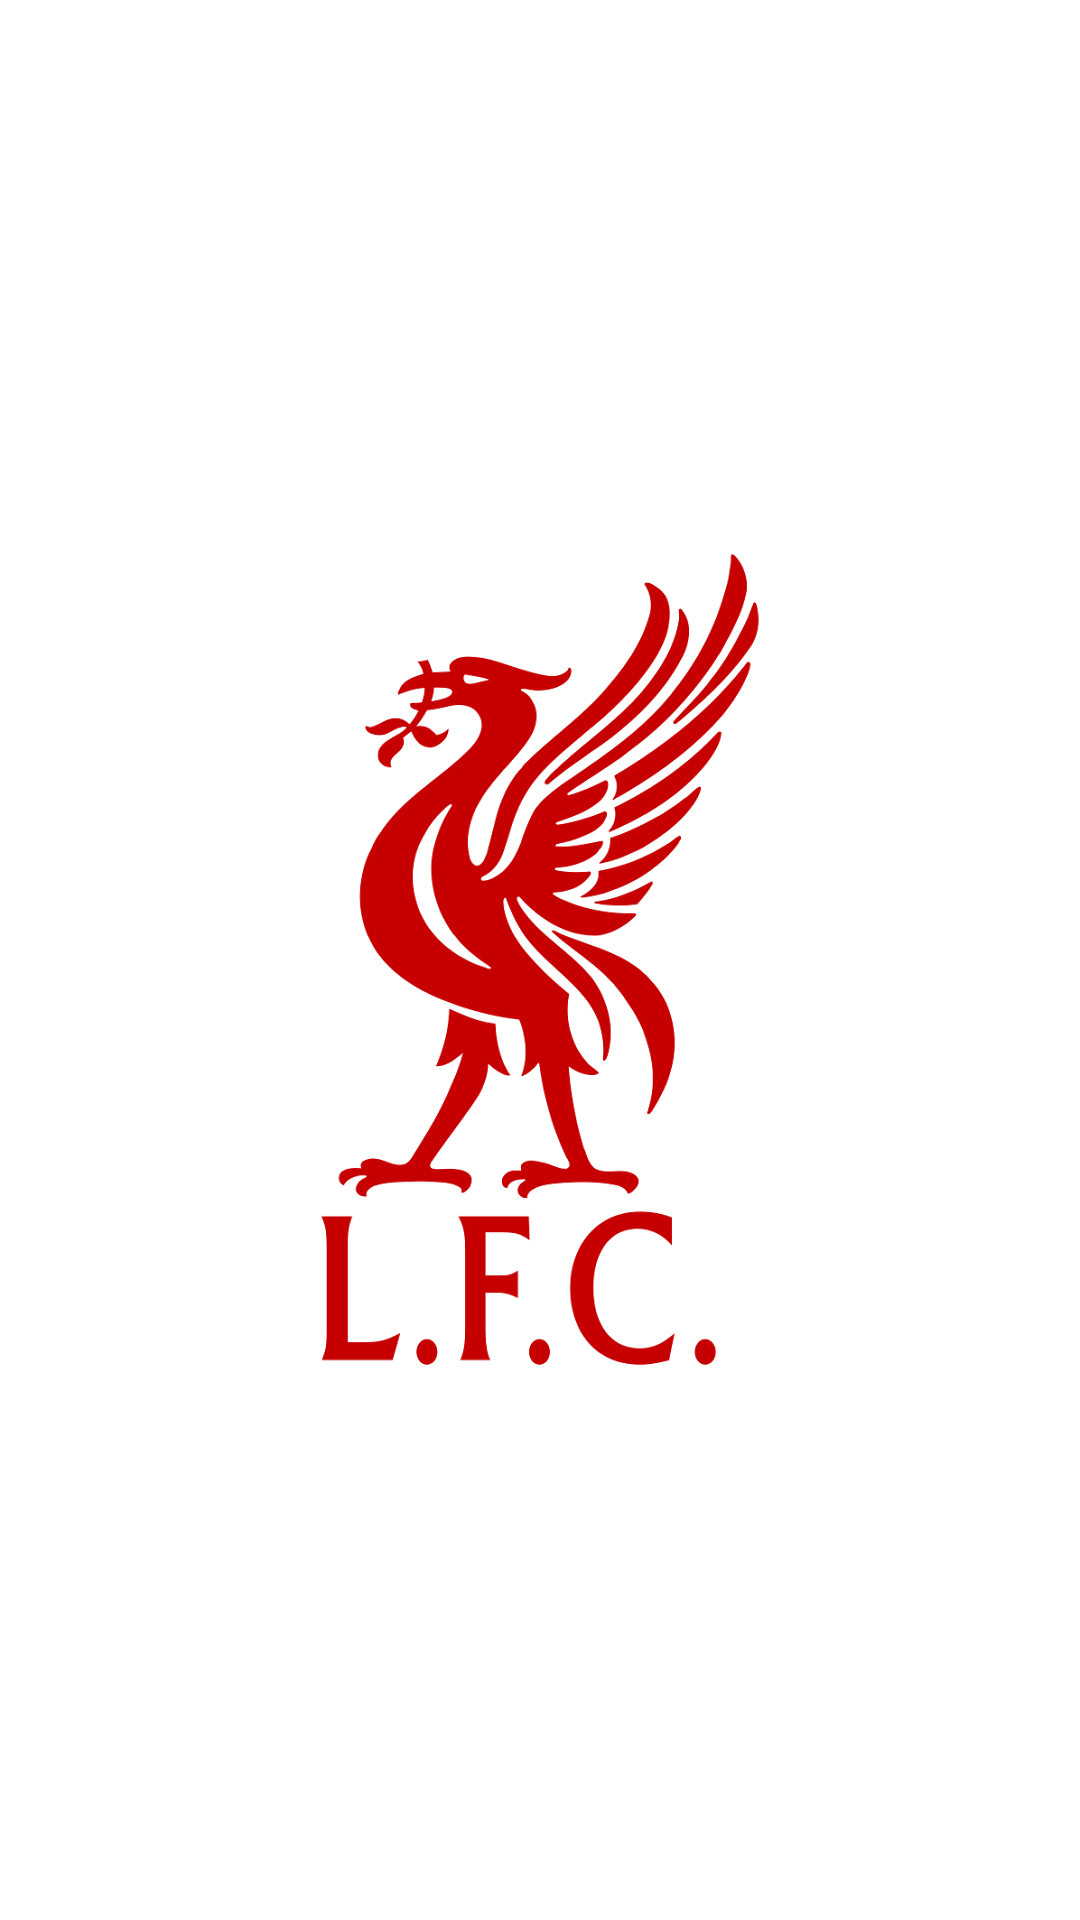 Lfc Bird White & Data Src Liverpool Fc ...